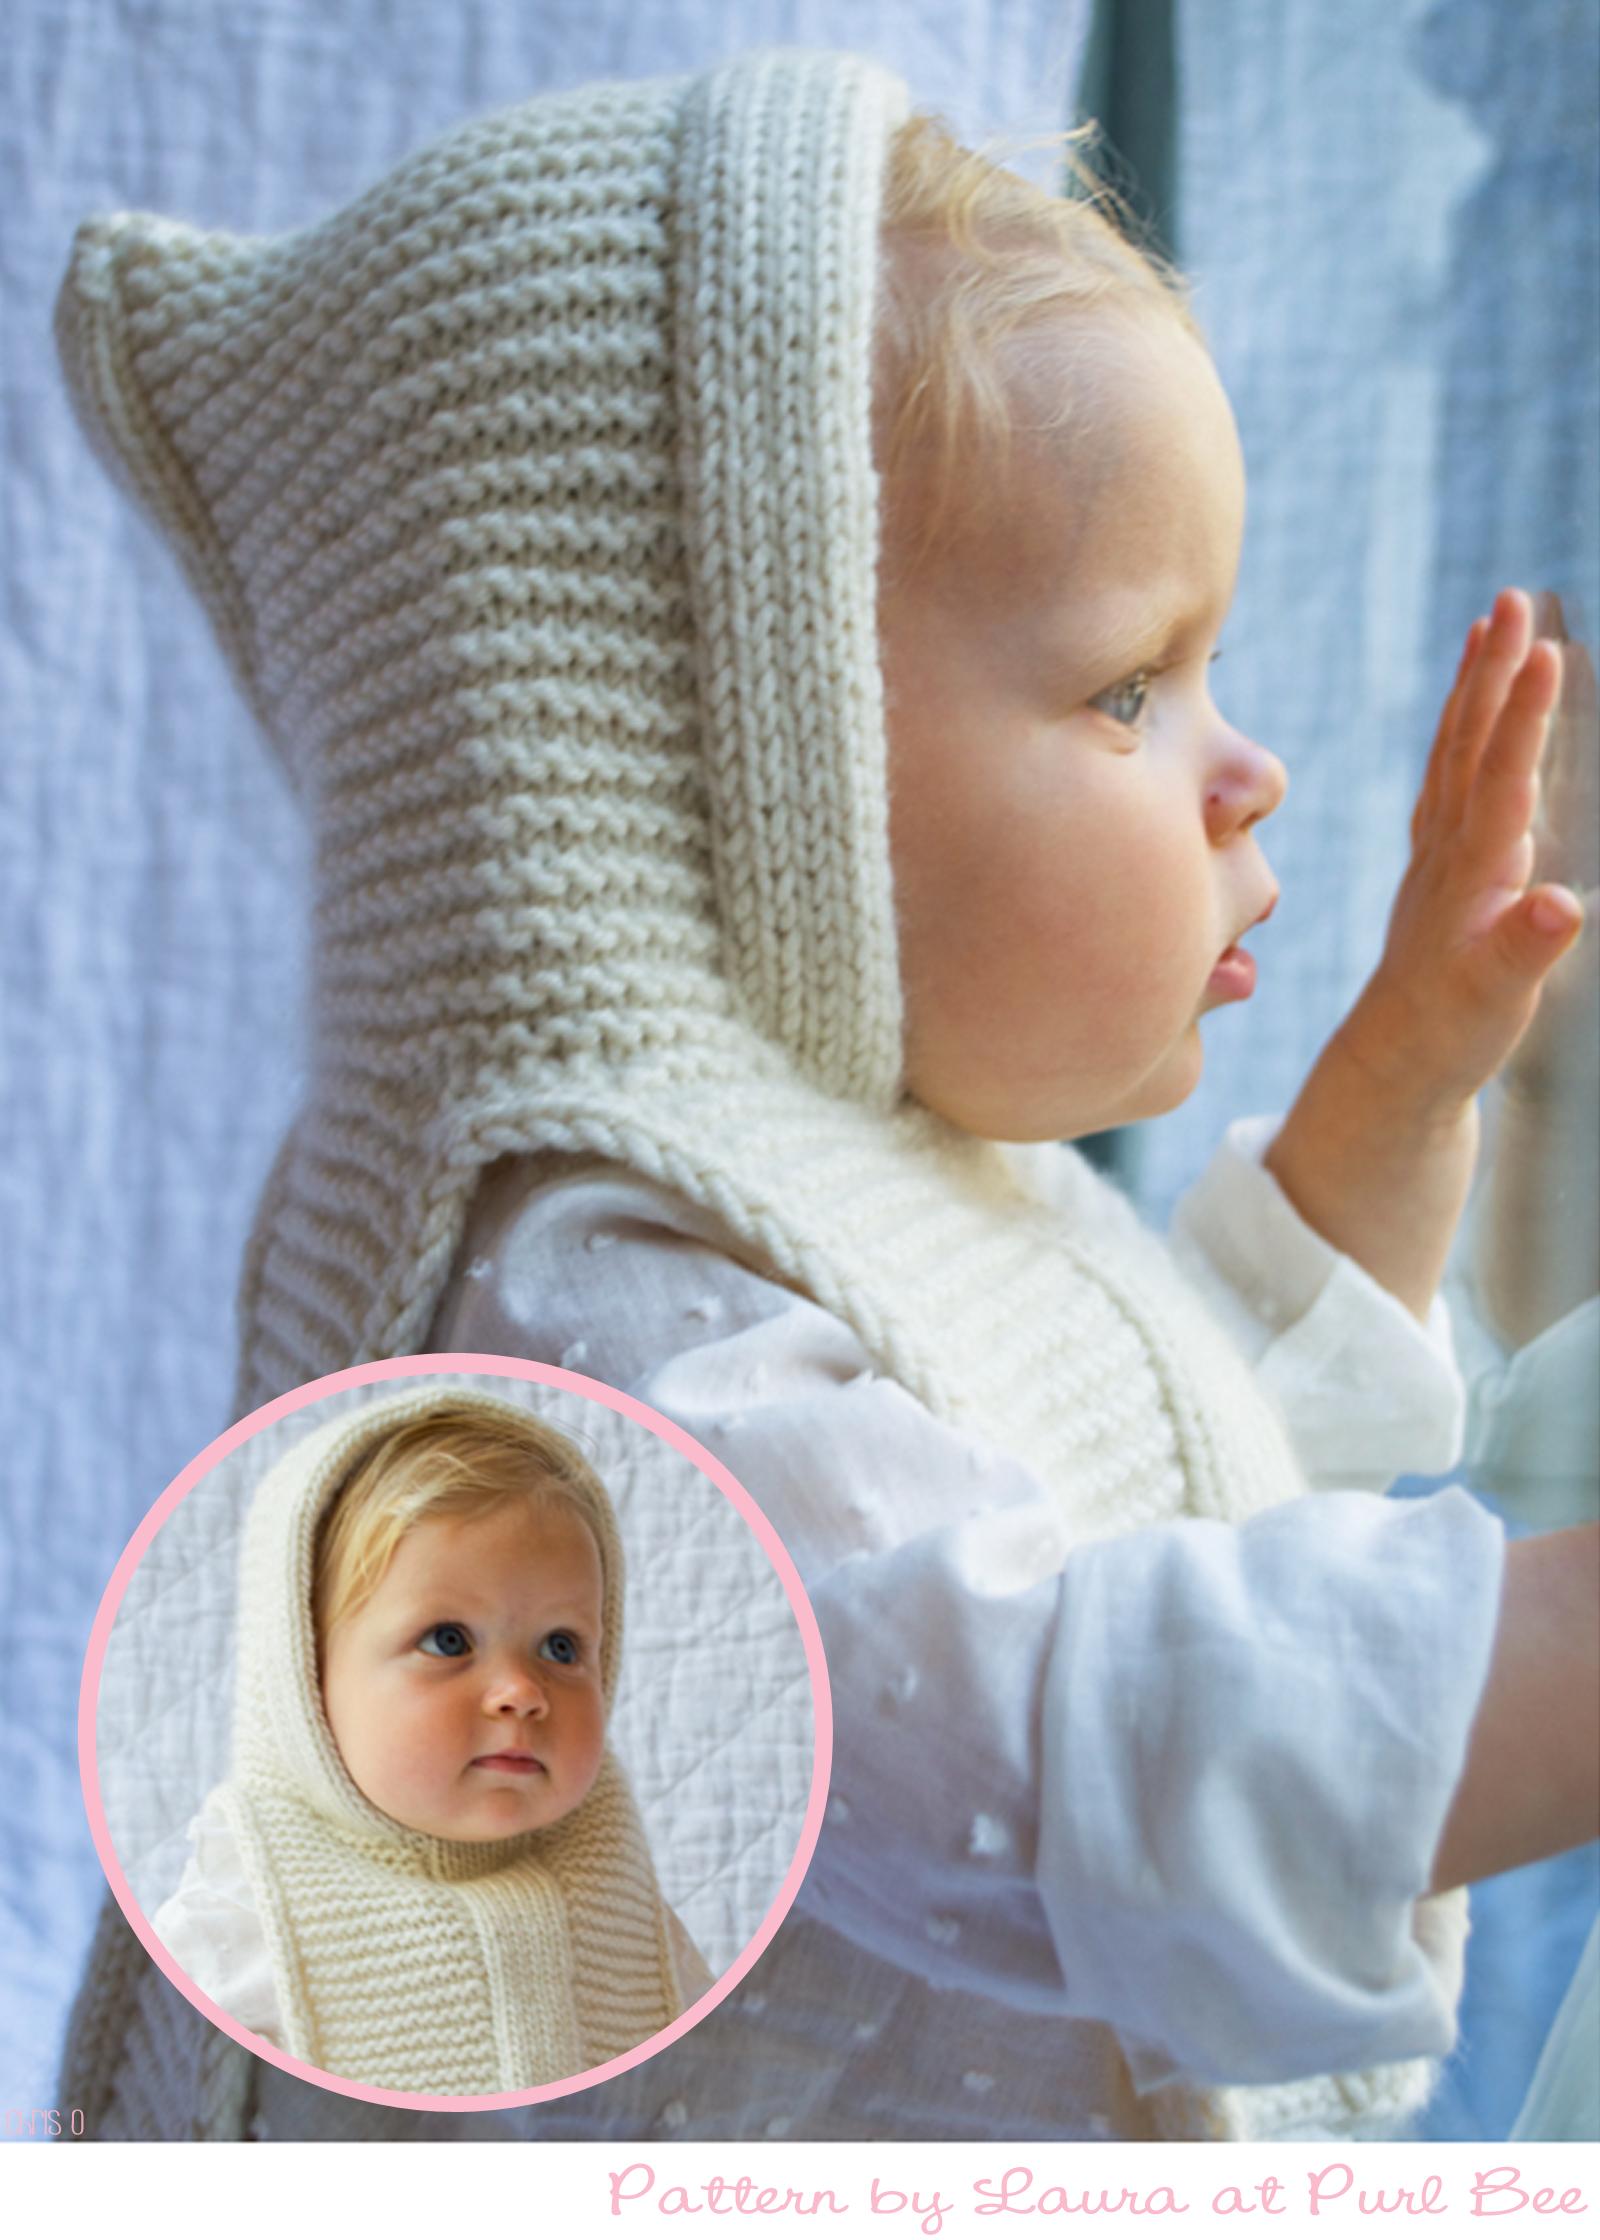 Momathon Blog: Snug as a Bug {Knitting a Hoodie Popover for Baby}